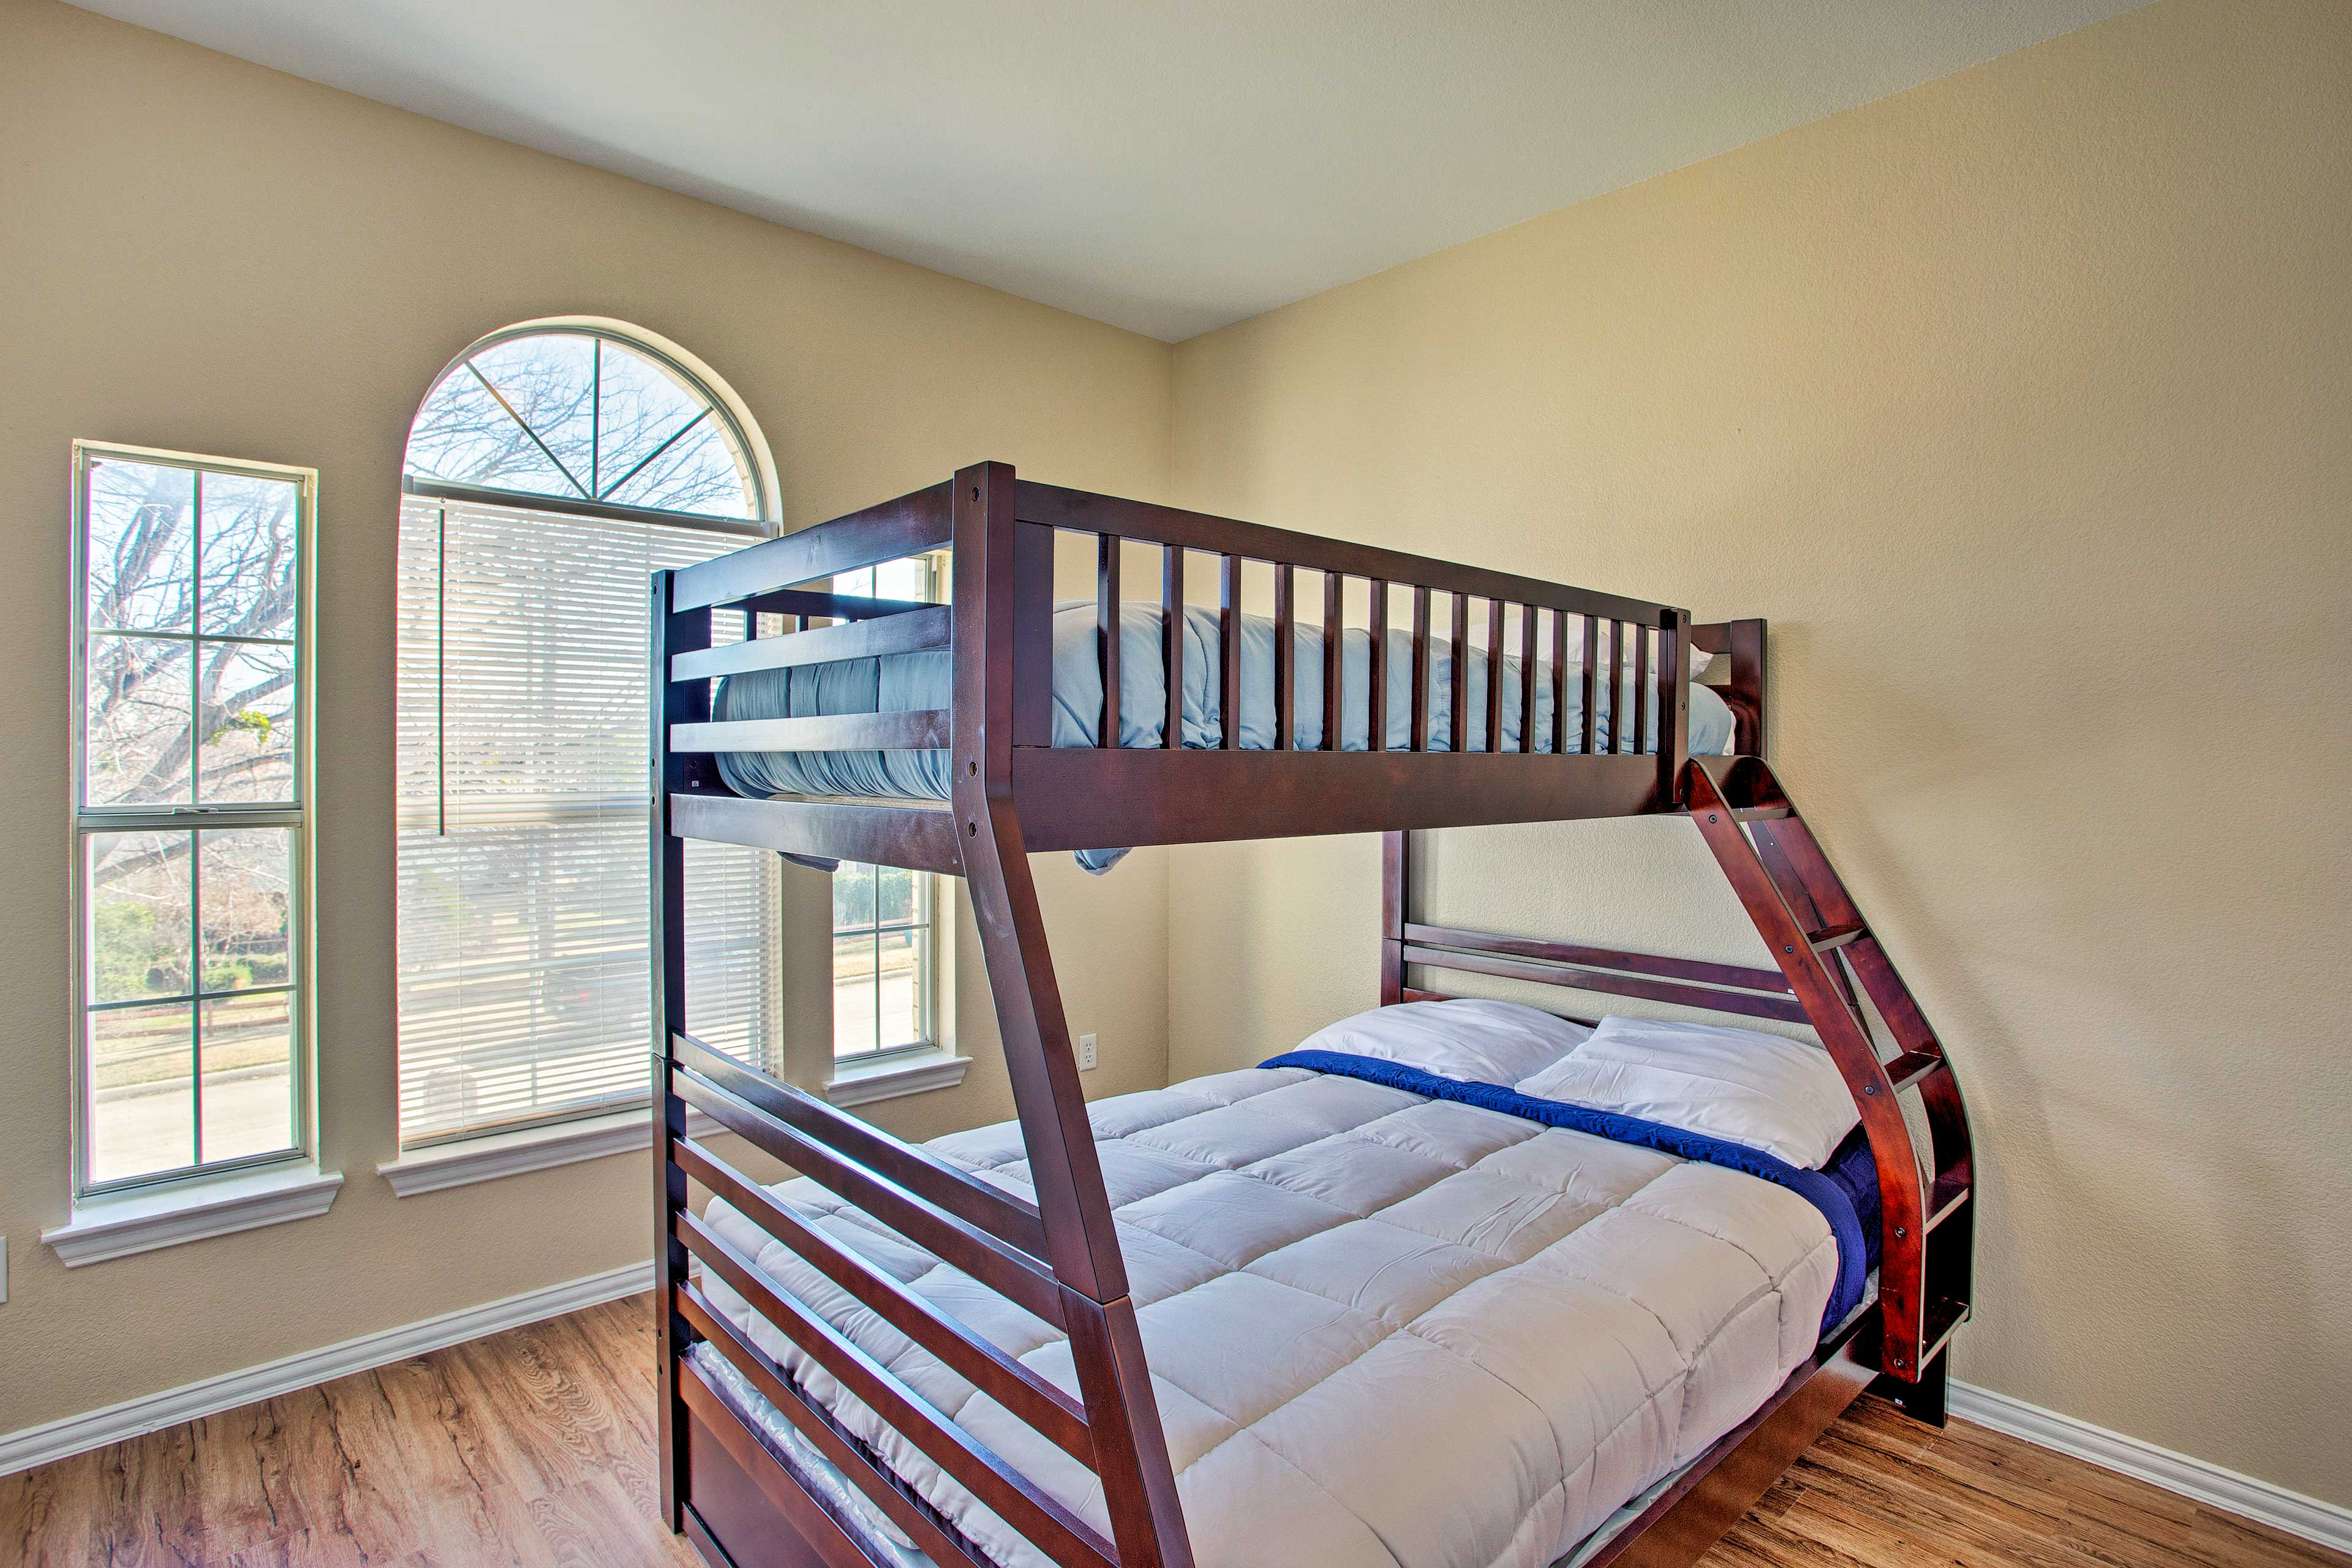 Bedroom 3 comfortably sleeps 3 in the full/twin bunk bed.